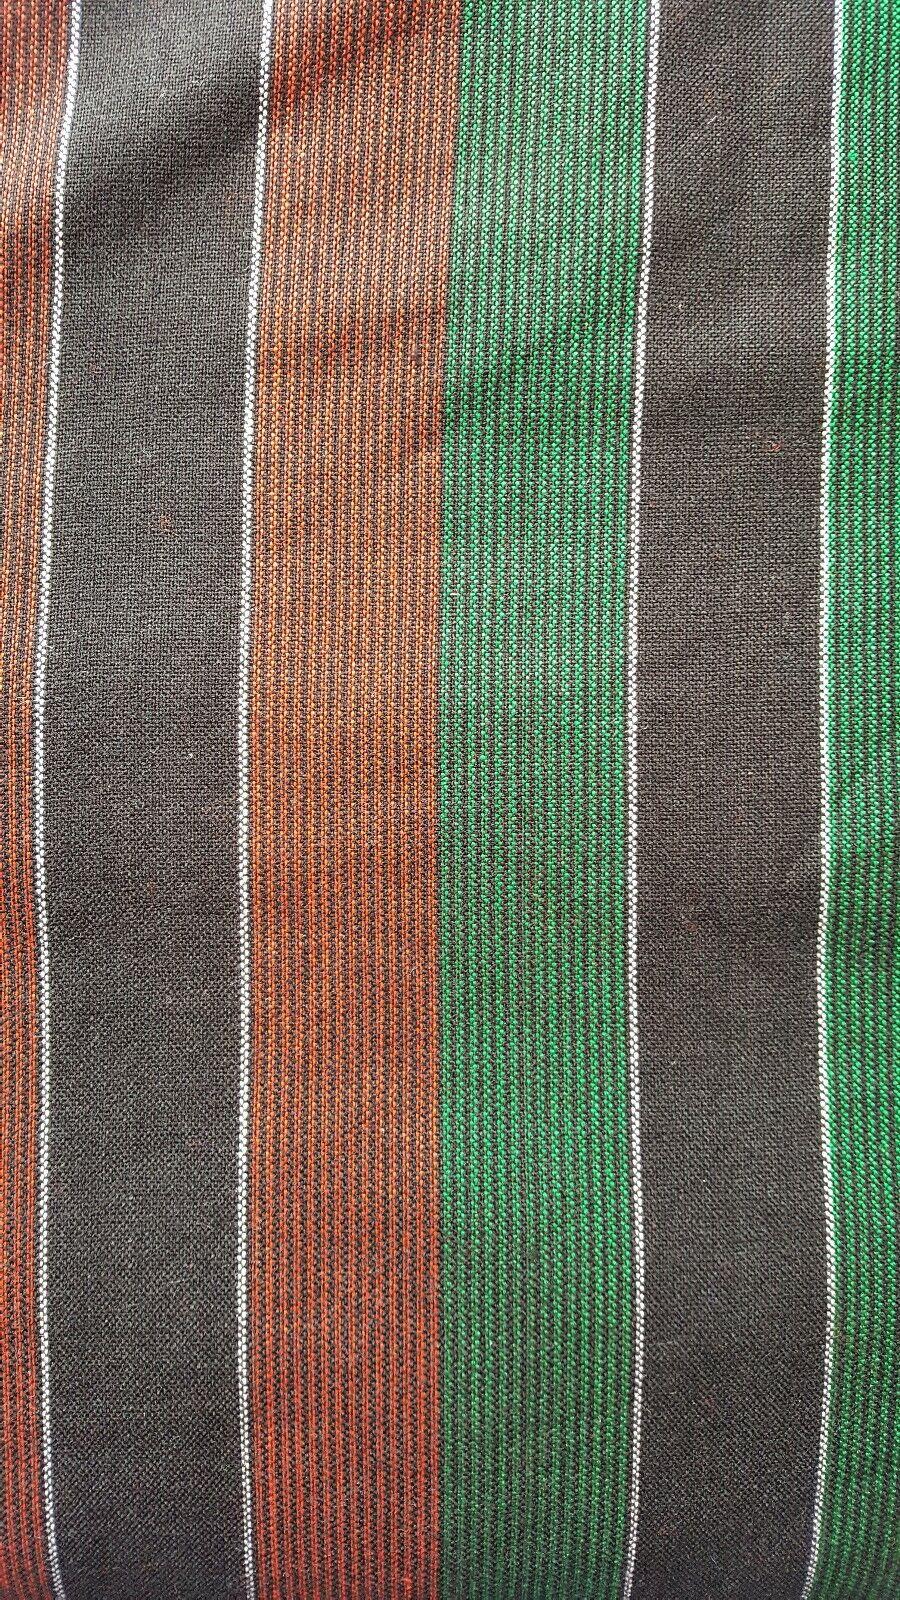 African Masai Maasai Tribal Shuka Throw Blanket Wrap Black